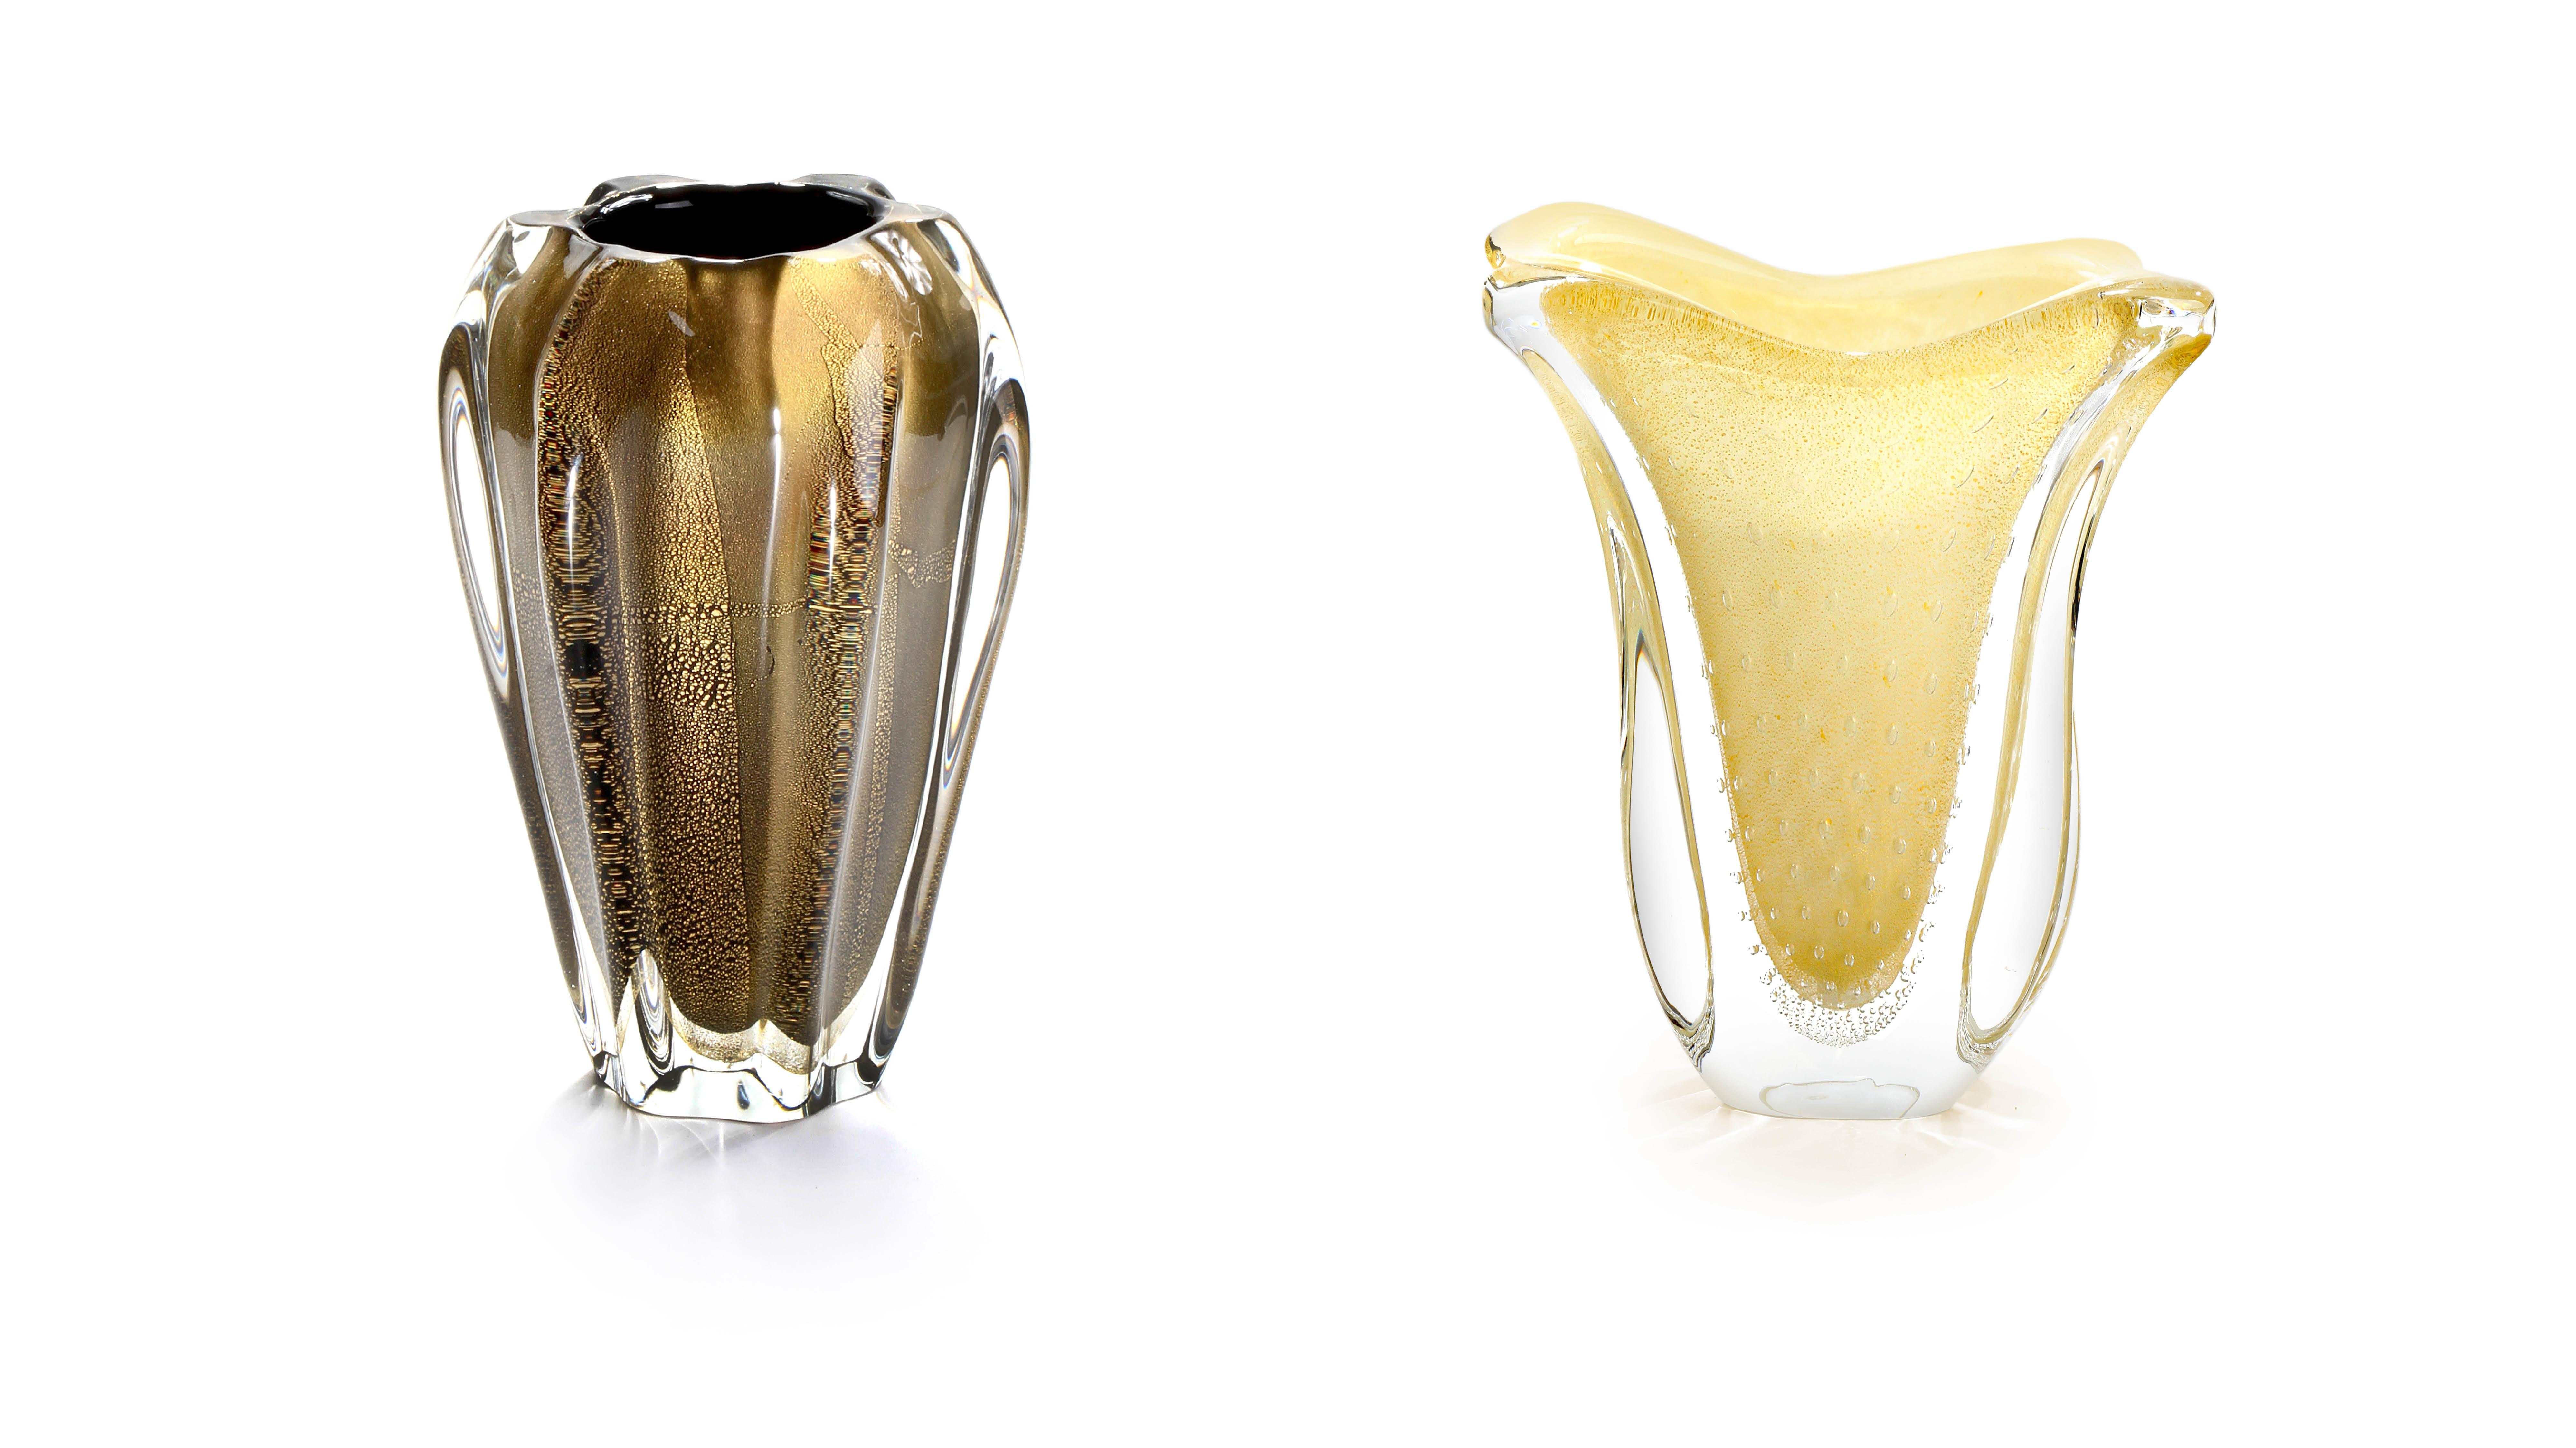 Vasos de vidro tipo Murano com ouro 24k.